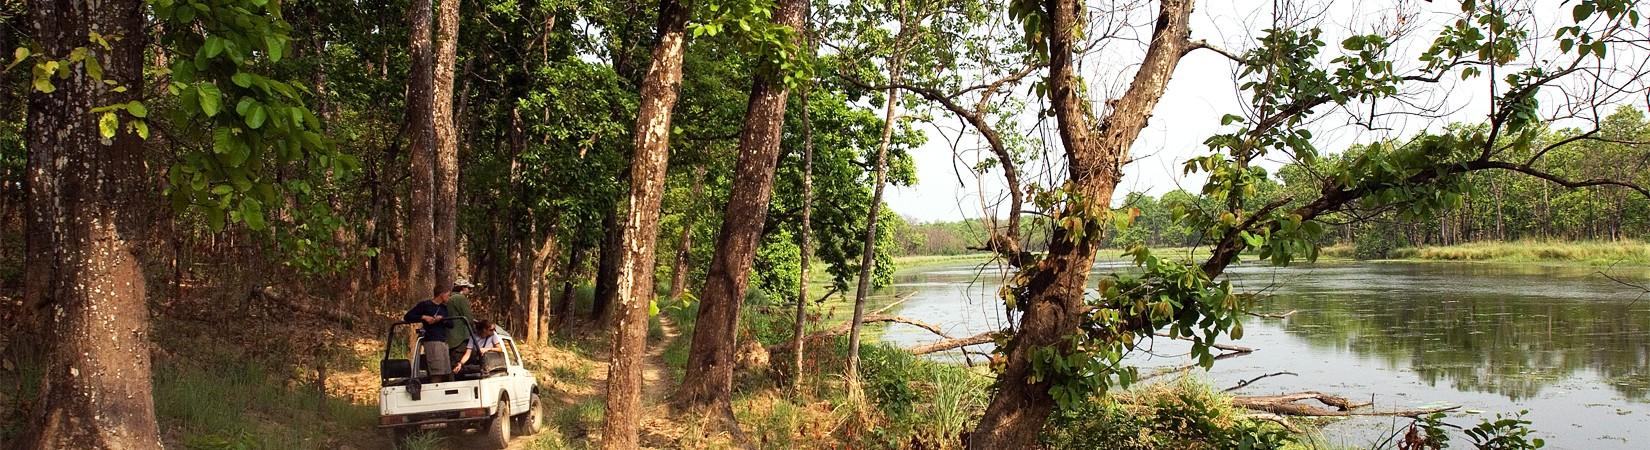 chitwan national park activities